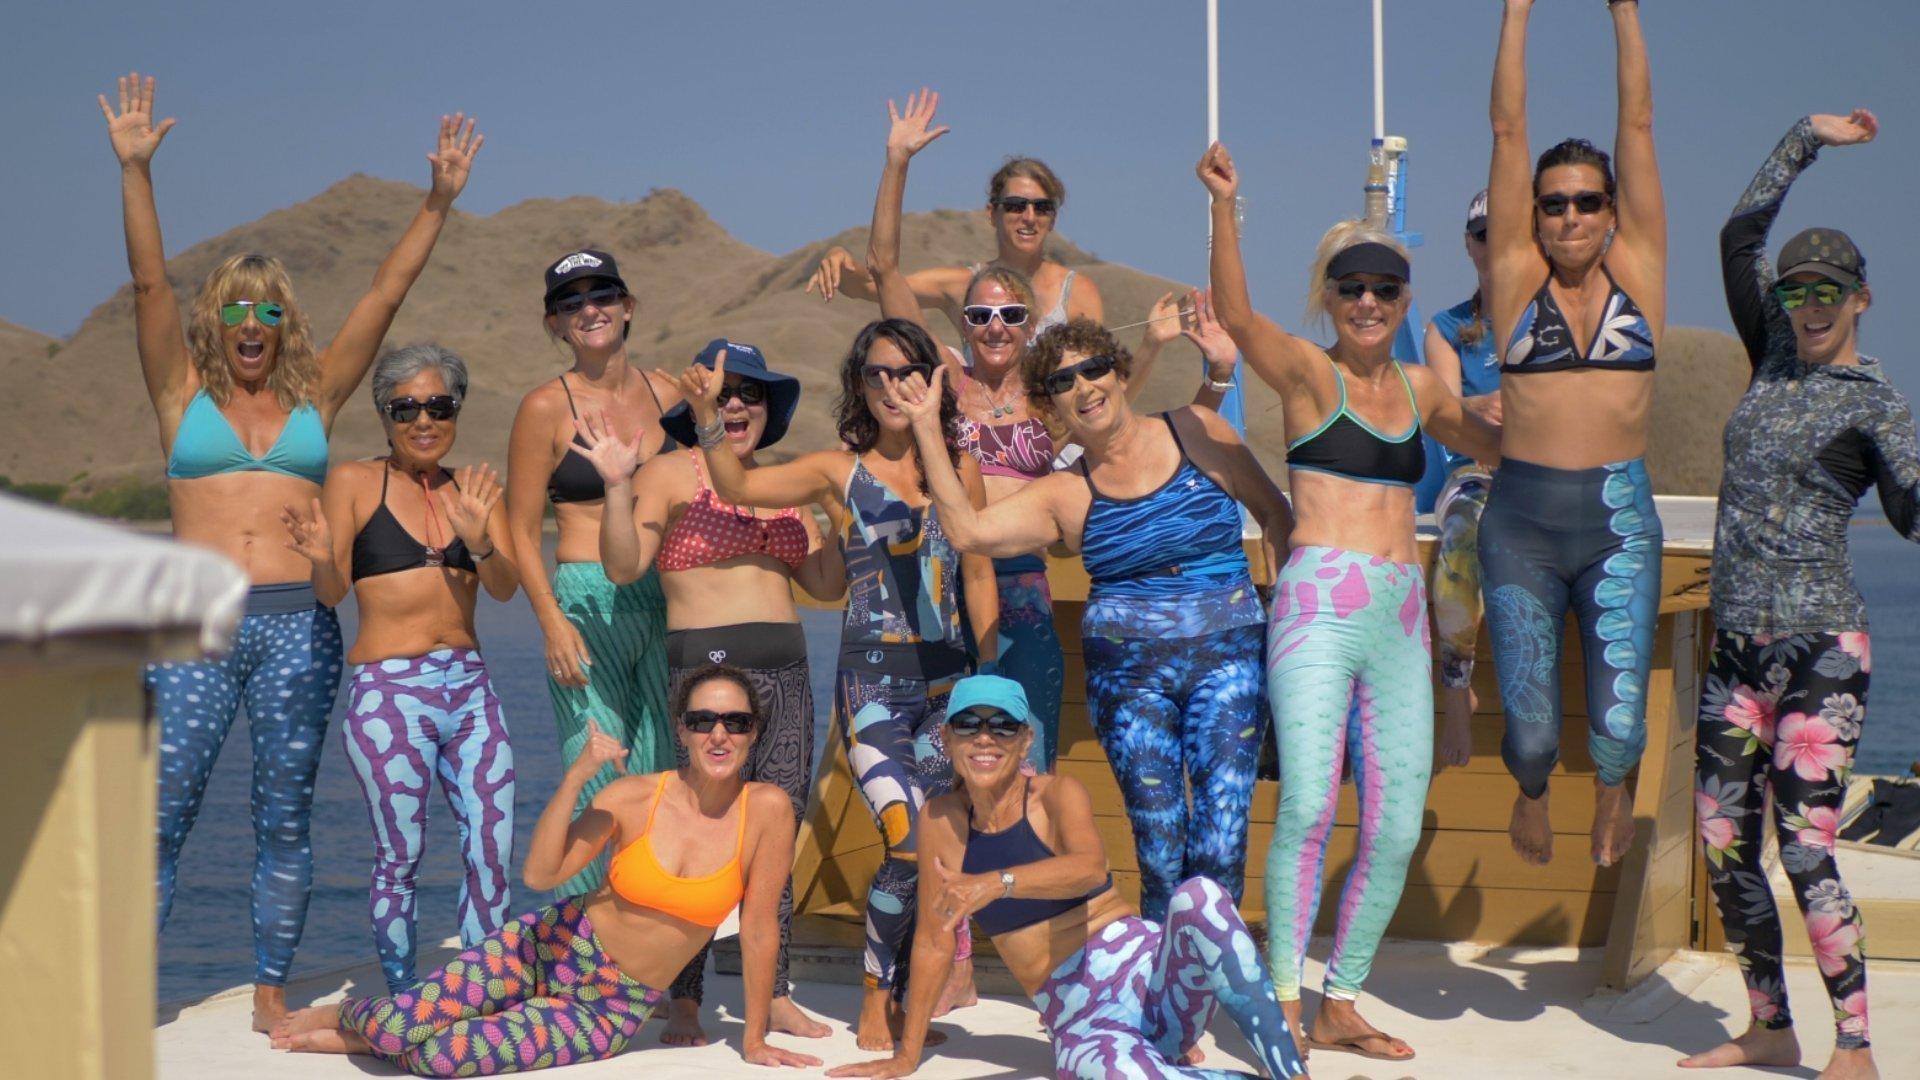 Happy snorkel venture guests